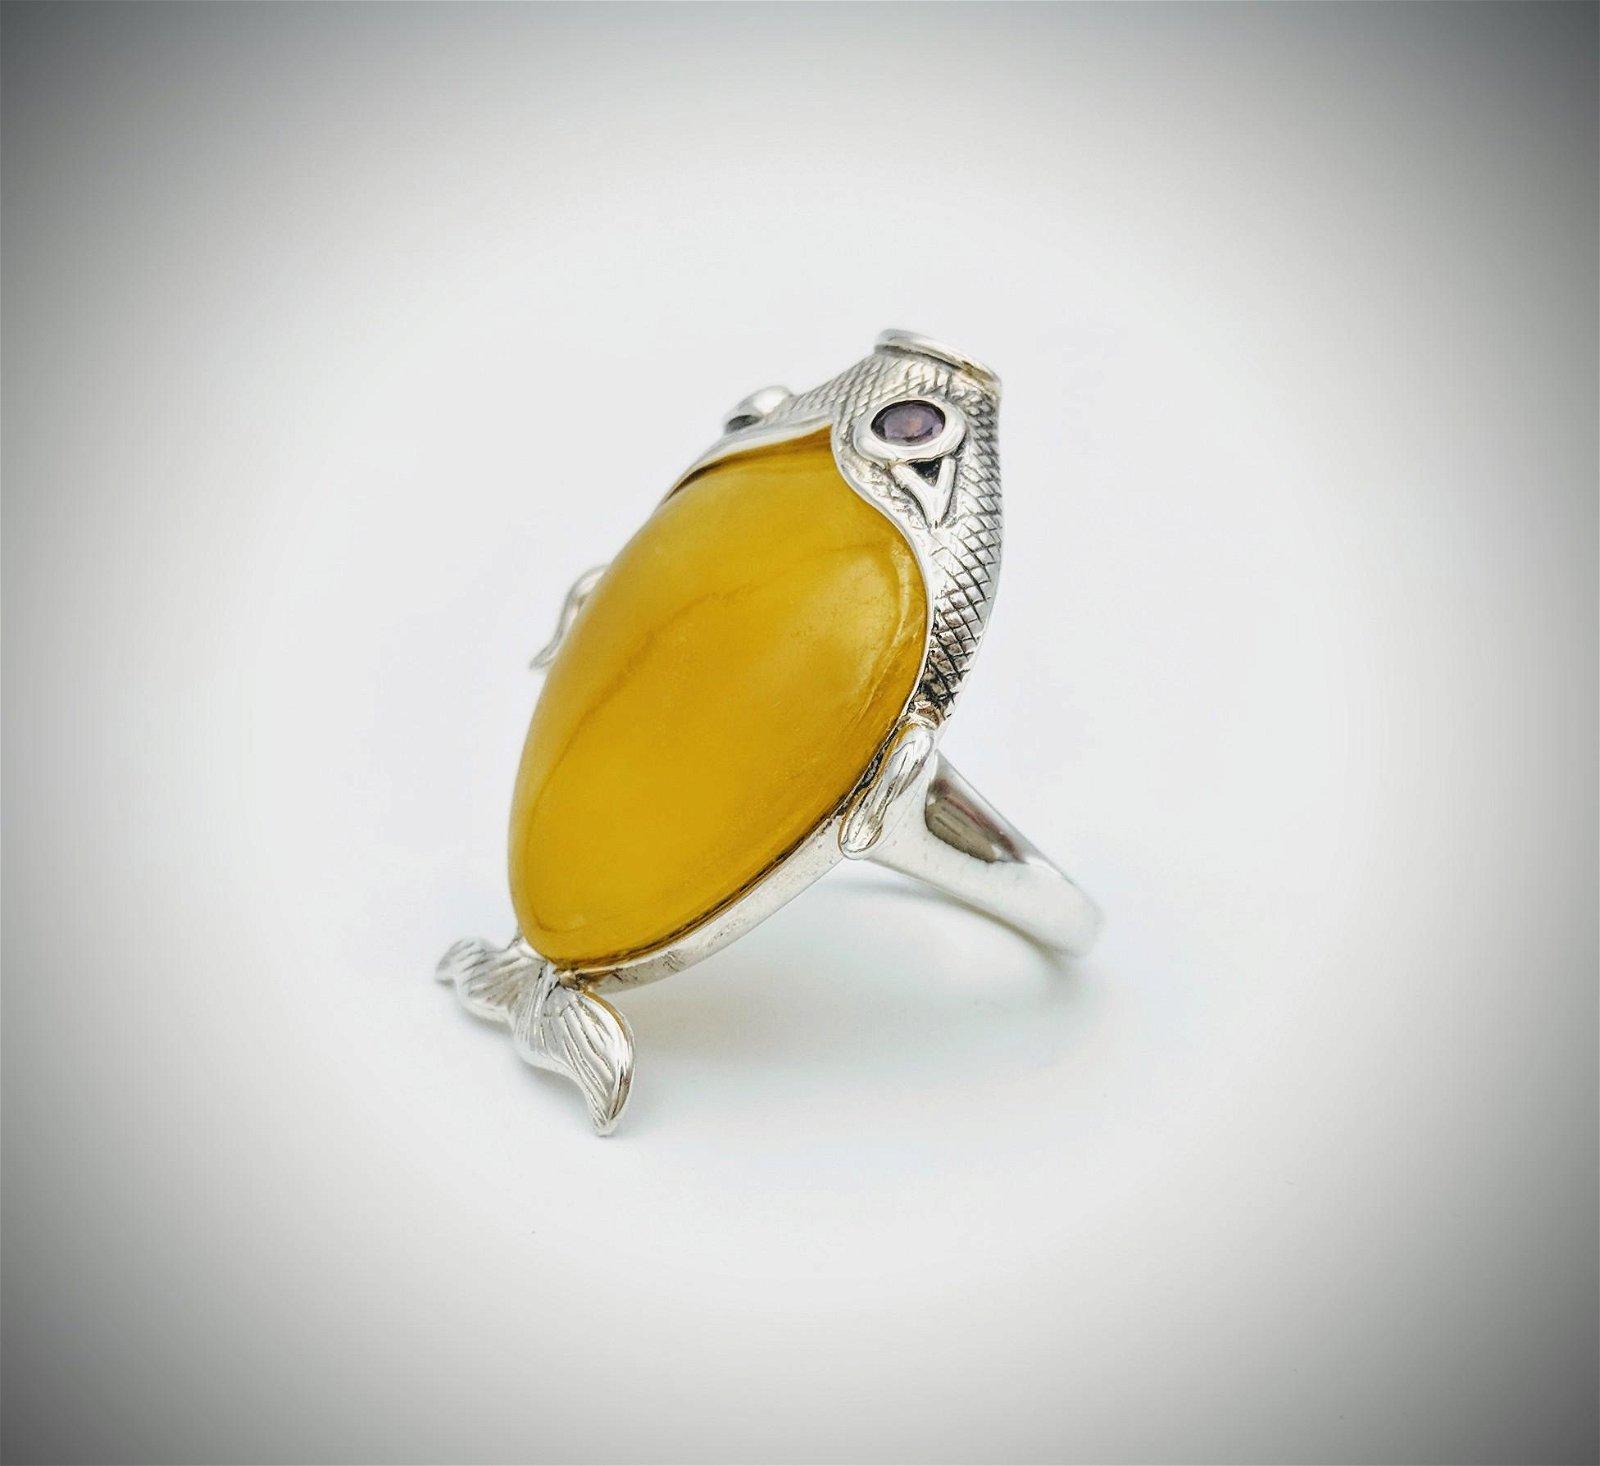 925 SS Fish Designed Sz 7 Ring w Yellow Jade & Amethyst